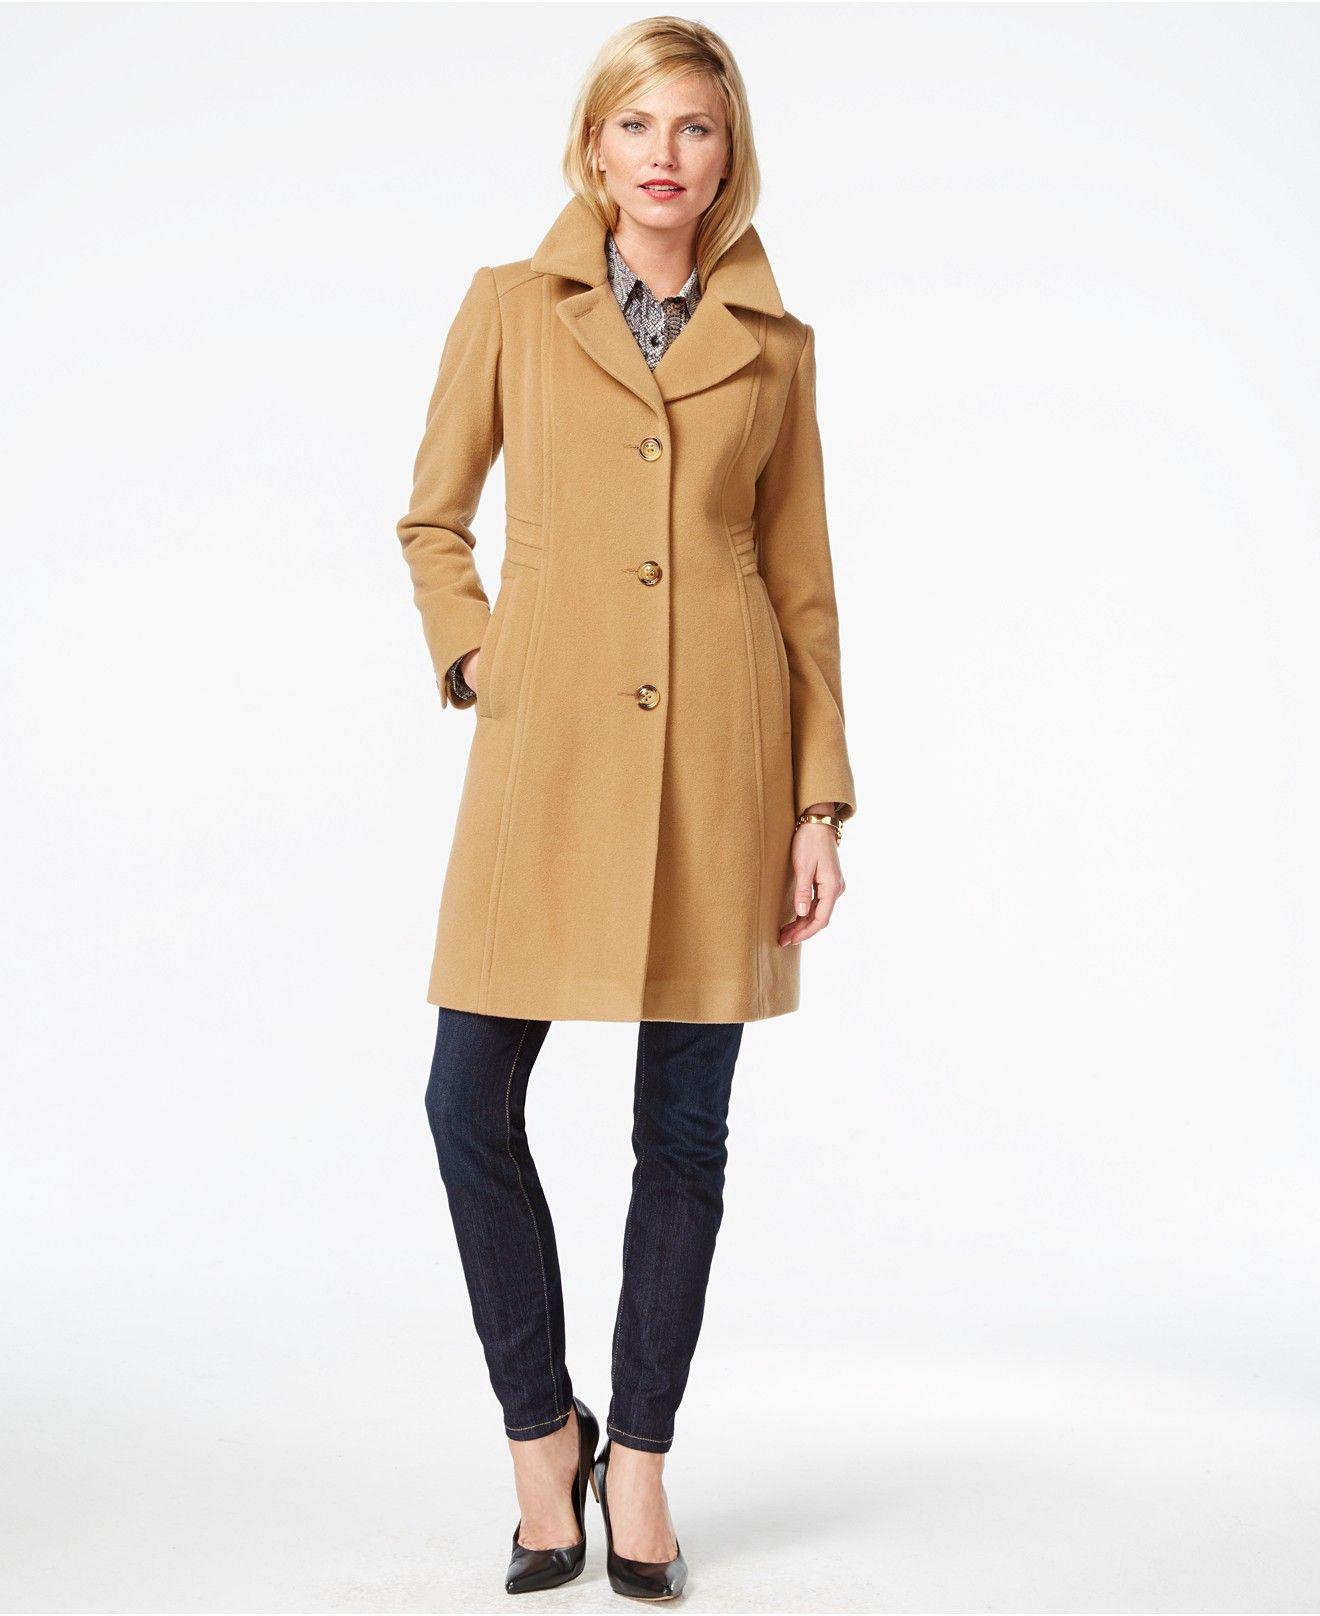 Anne Klein Petite Wool Cashmere Walker Coat Coats Women Macy S Coats For Women Coat Fashion [ 1616 x 1320 Pixel ]